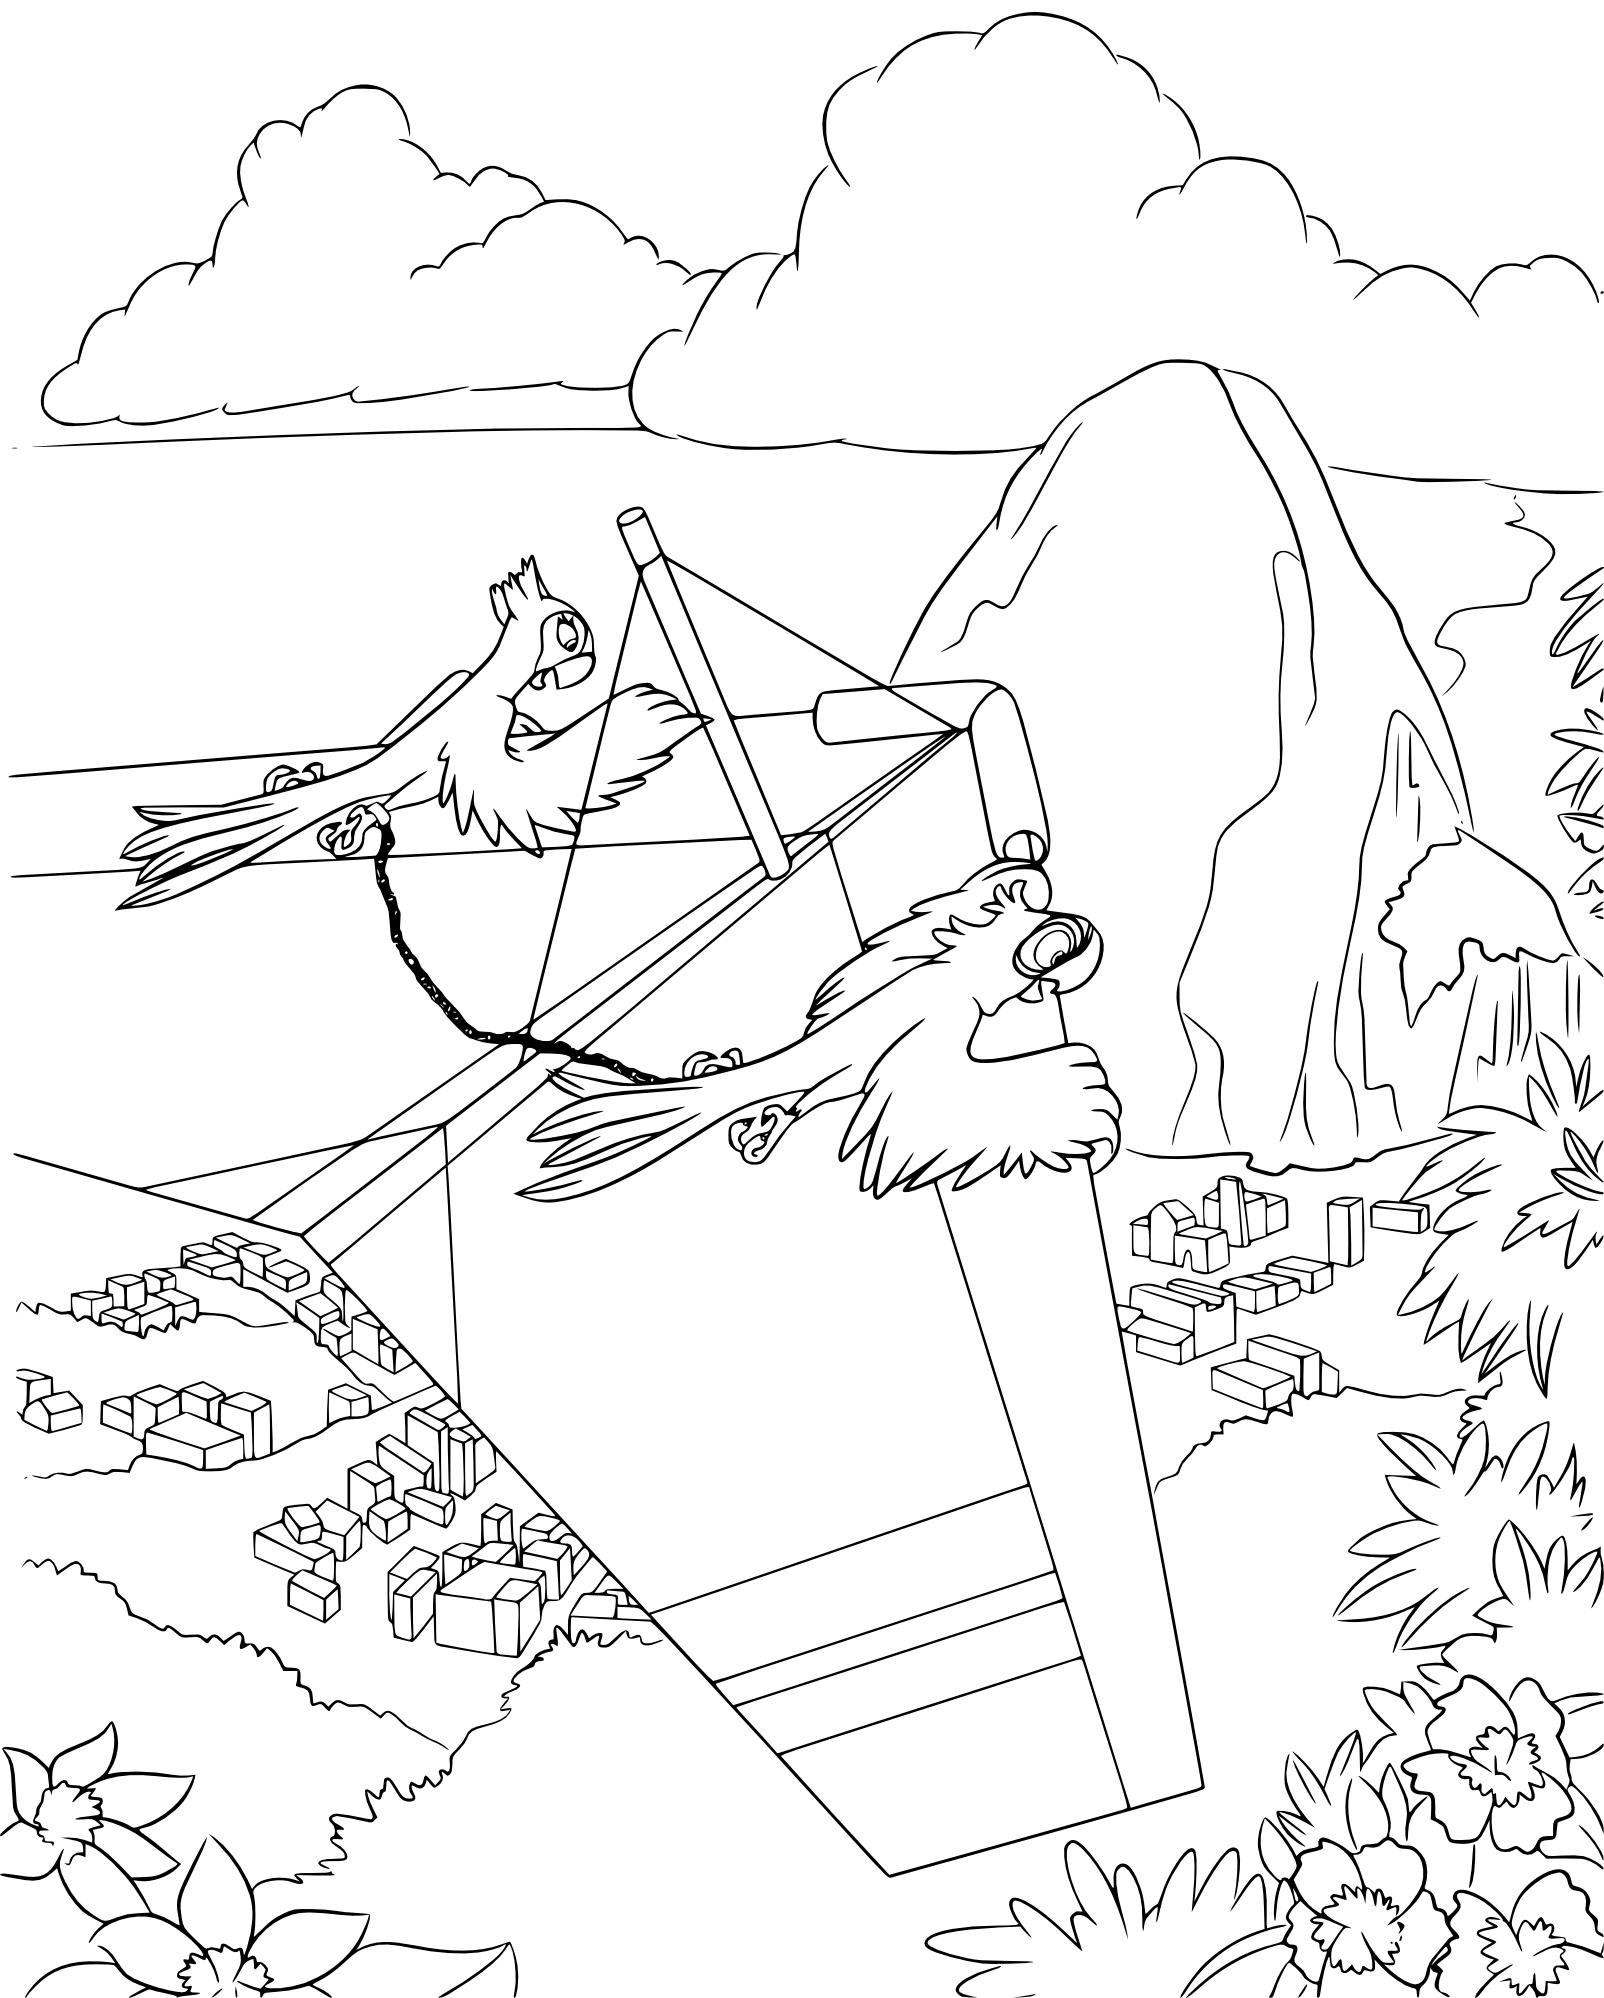 Coloriage Rio deltaplane